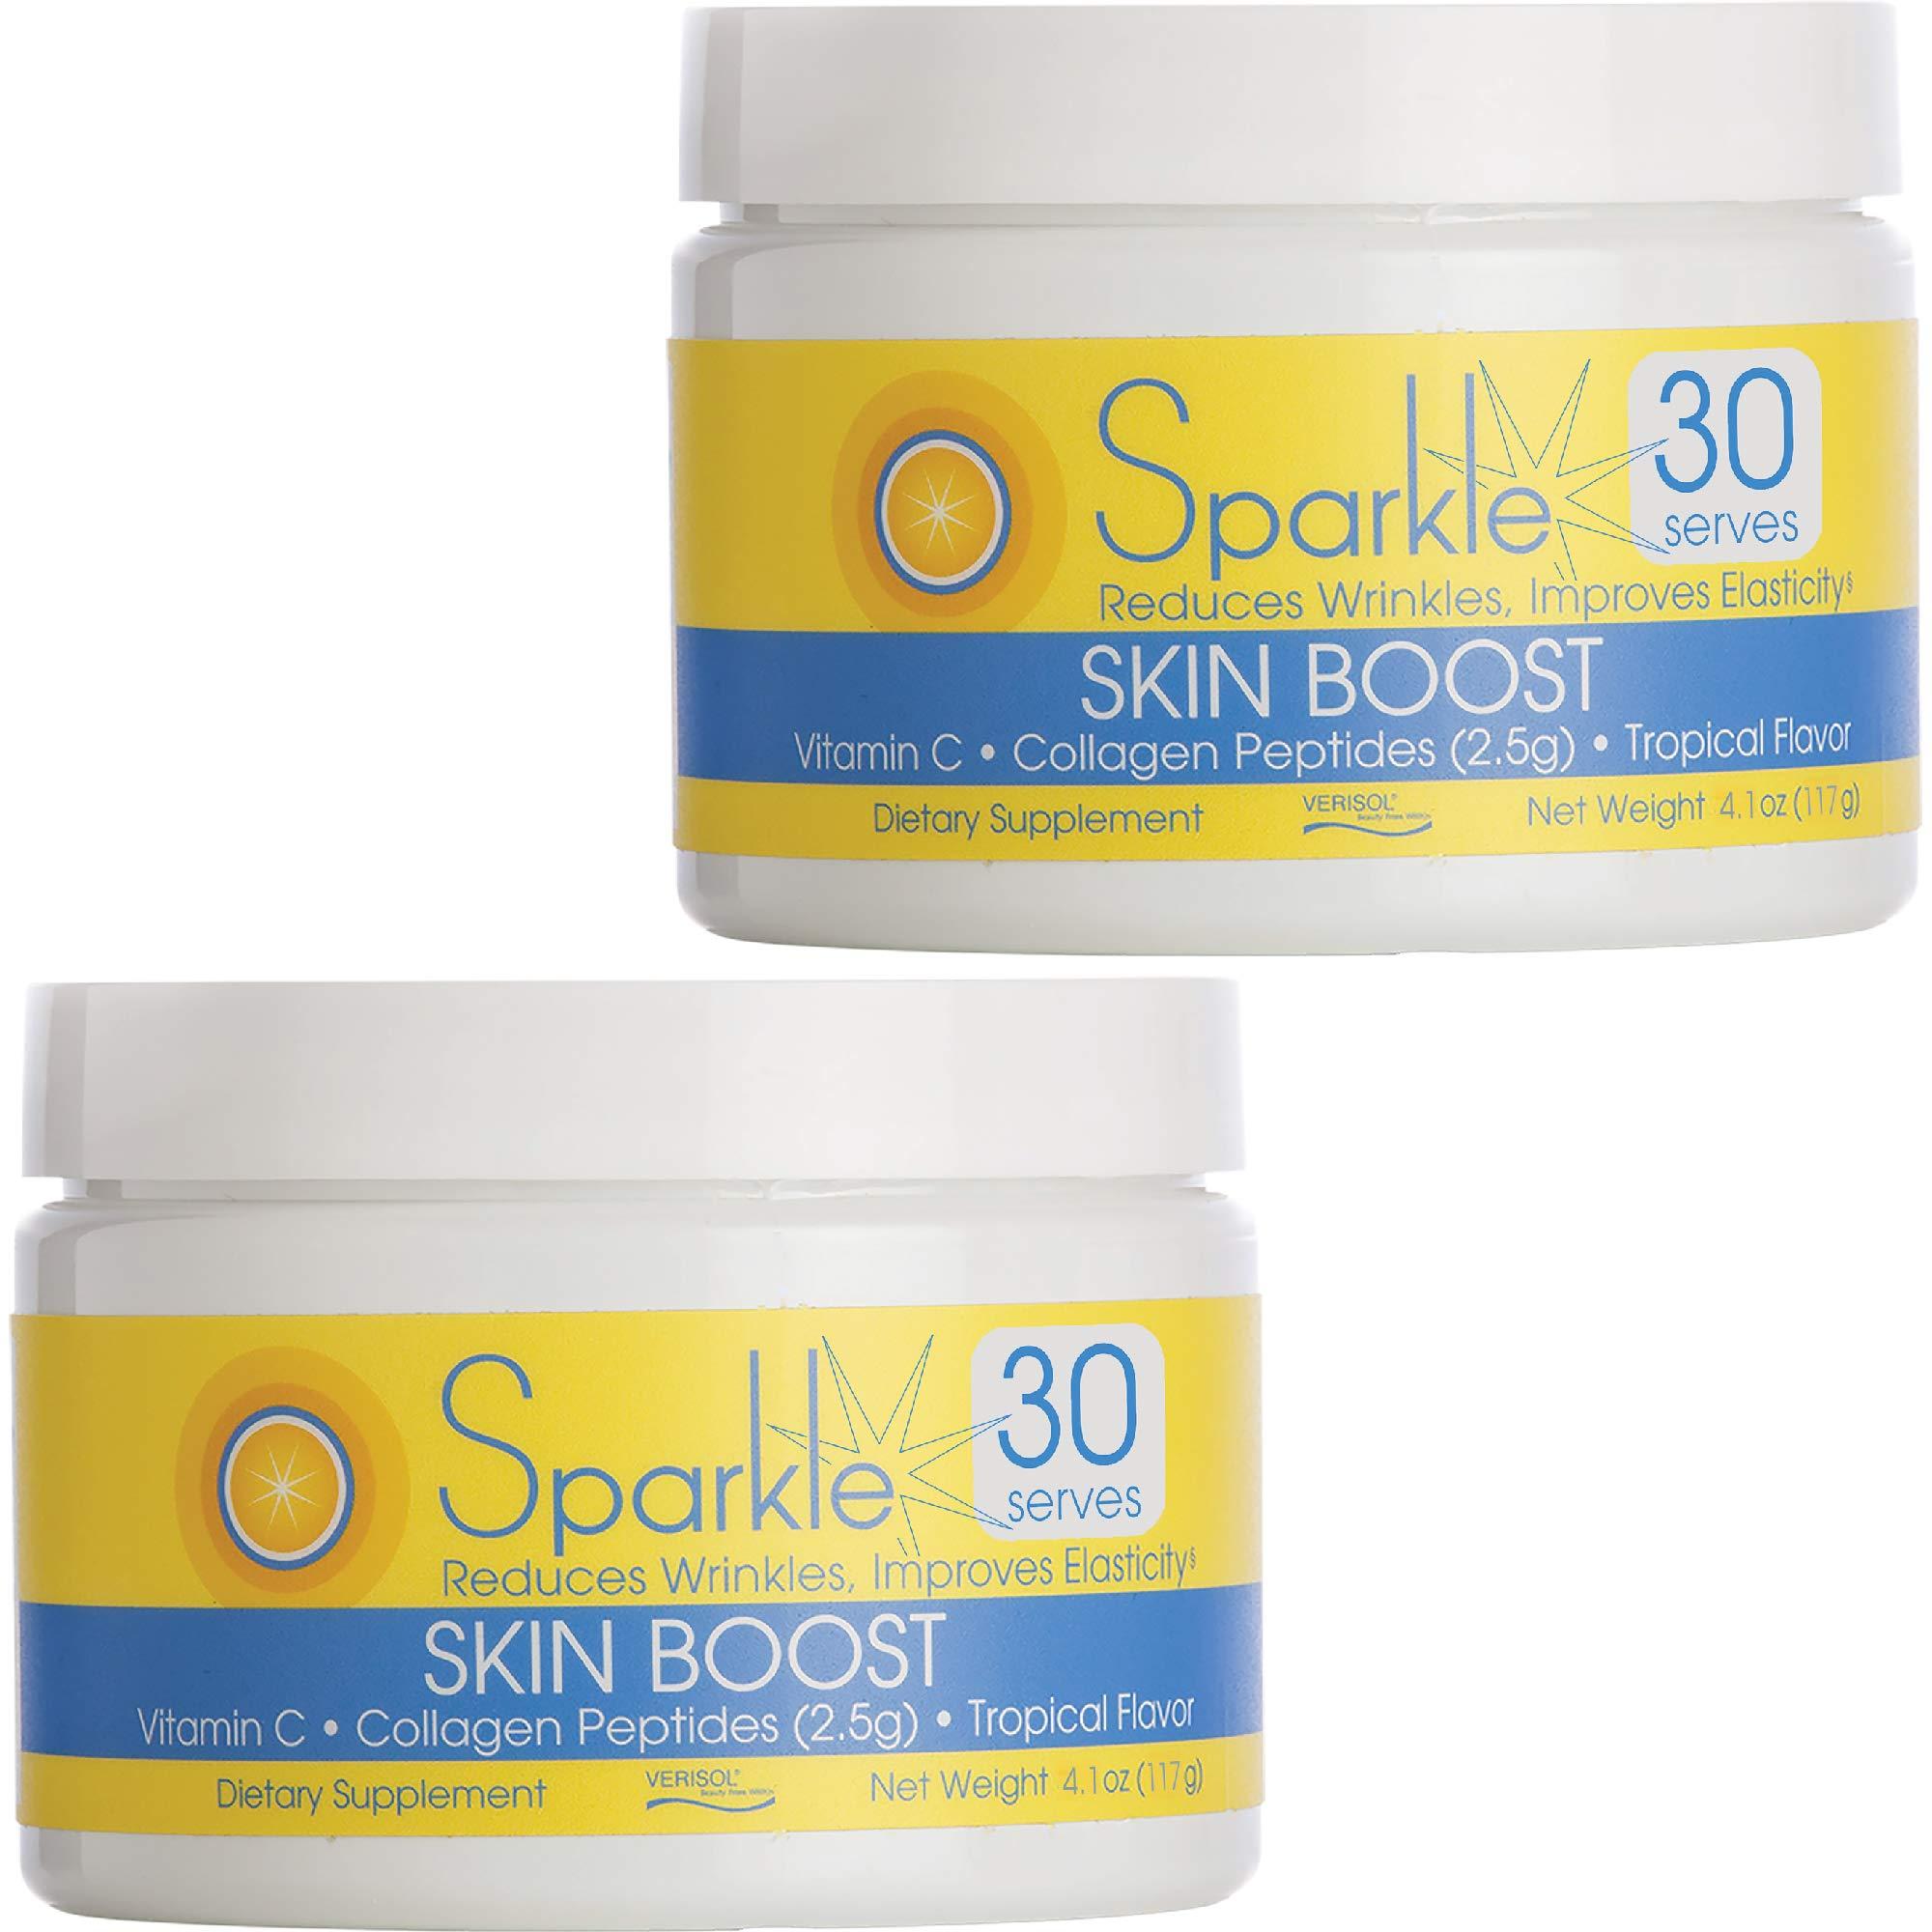 Sparkle Skin Boost (Tropical Coconut Pineapple) [2-Pack of 30-Serves] Verisol Collagen Peptides Protein Powder Vitamin C Supplement Drink